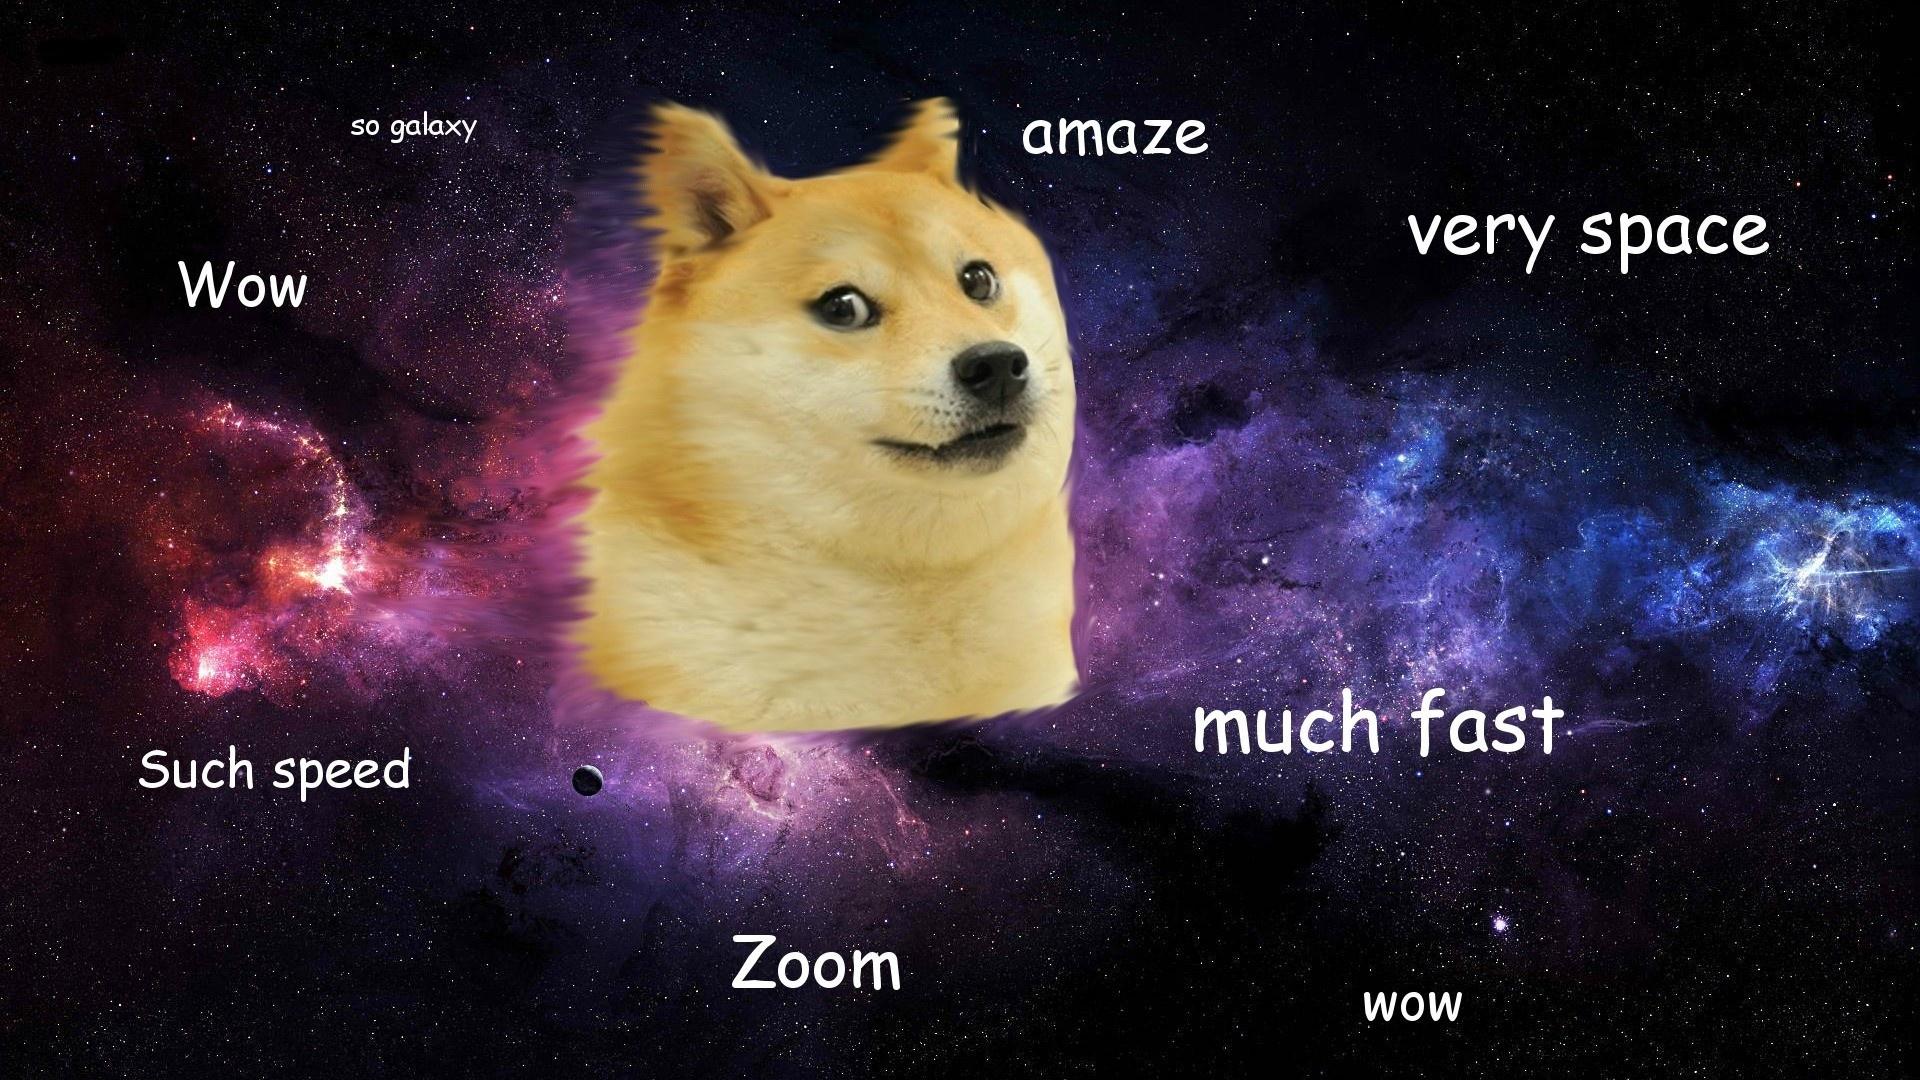 Doge Meme 1920x1080 wallpaper